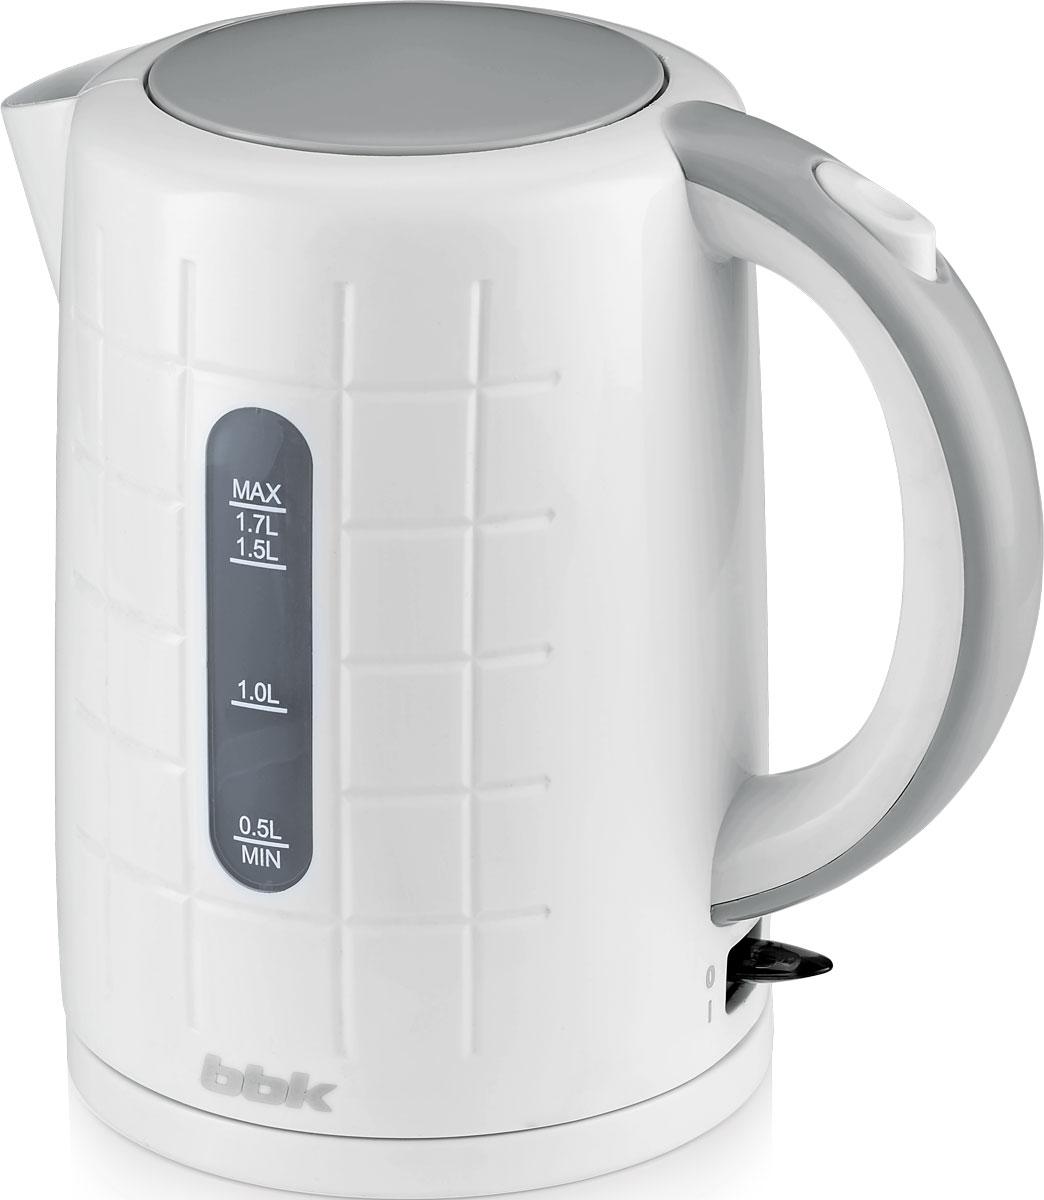 BBK EK1703P, White Metallic электрический чайник